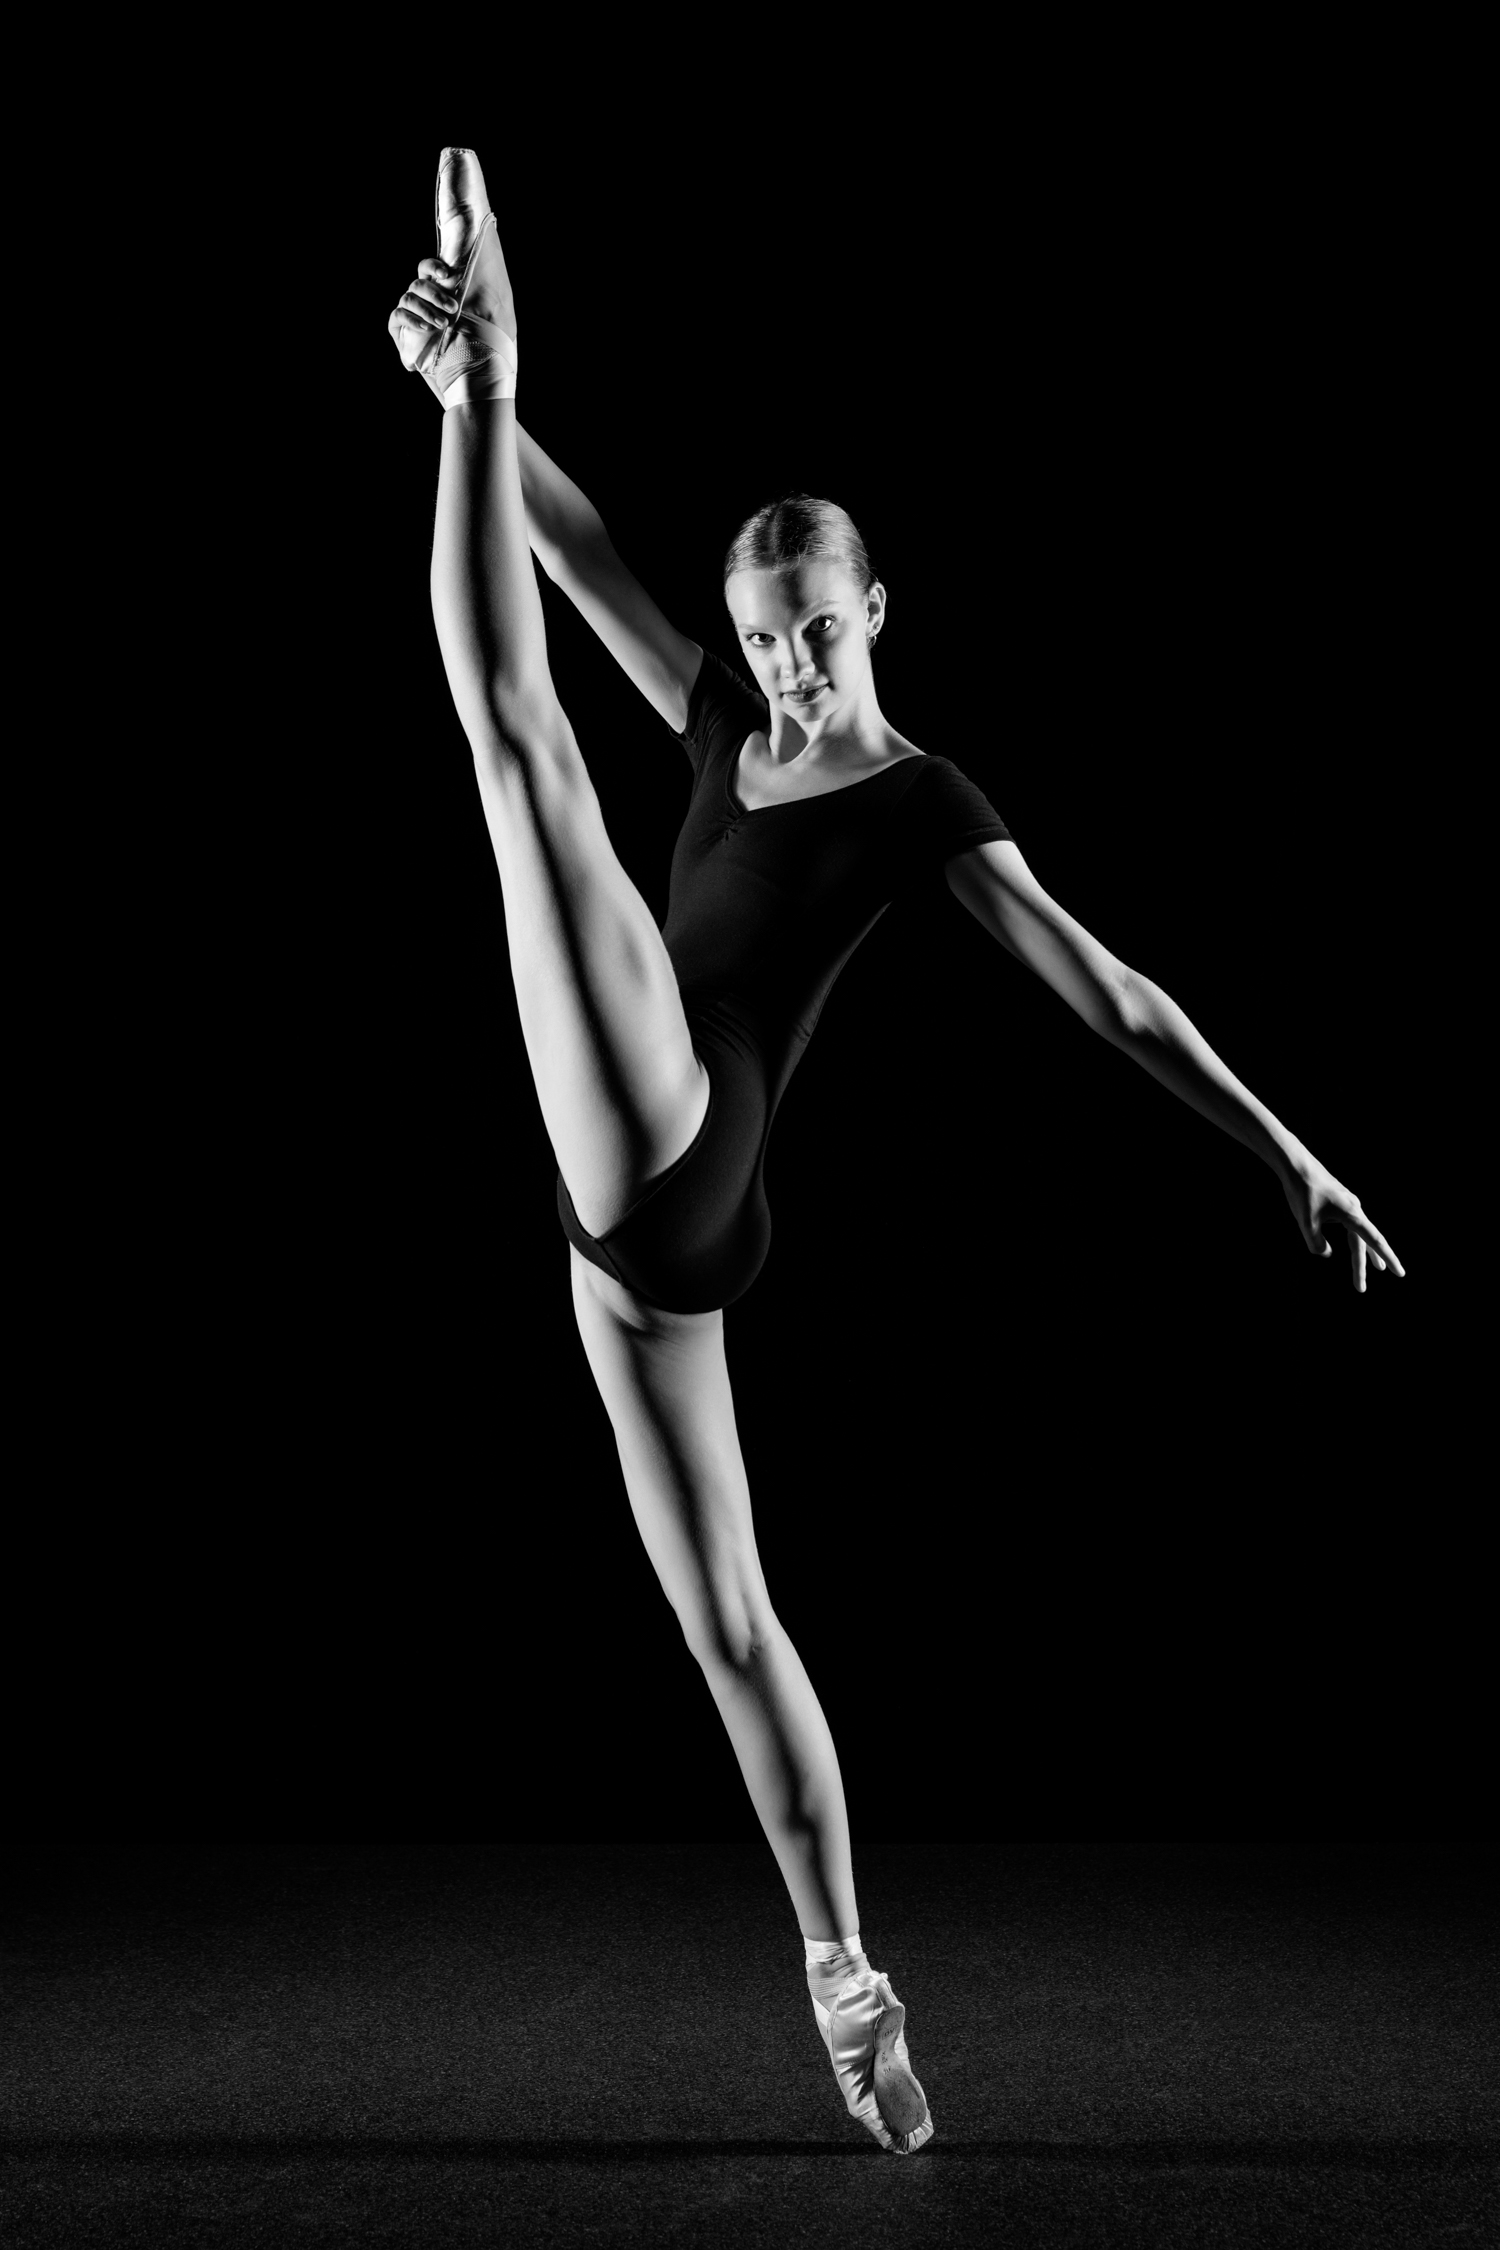 0686 Lisa-Marie Dance Shoot Studio ZW_W.jpg